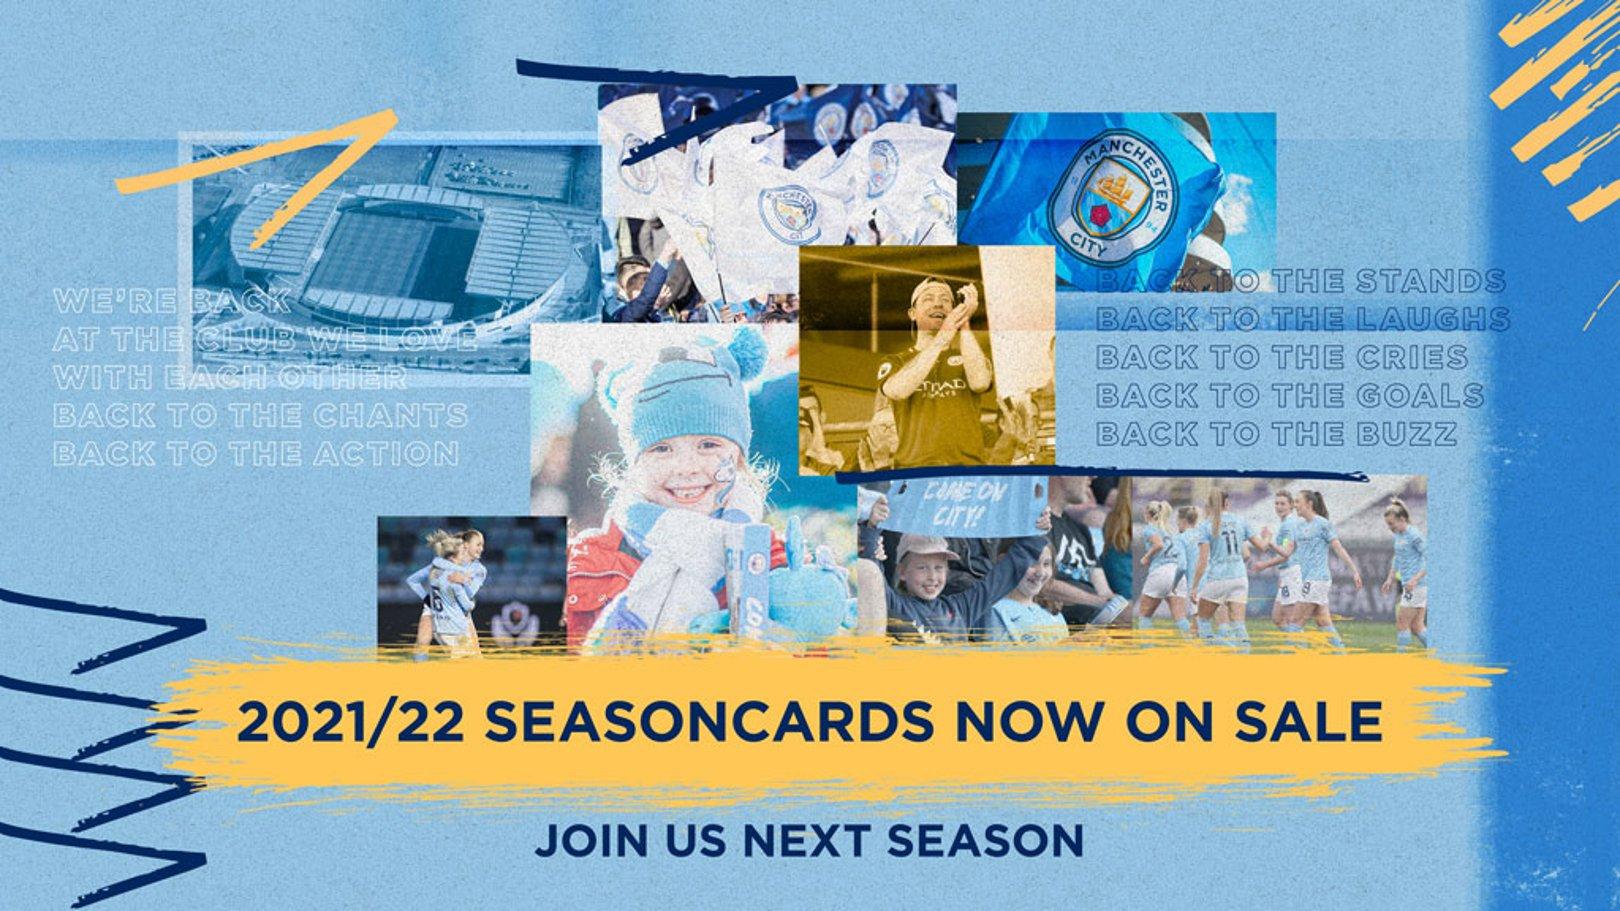 Manchester City Women: 2021/22 Seasoncard Information